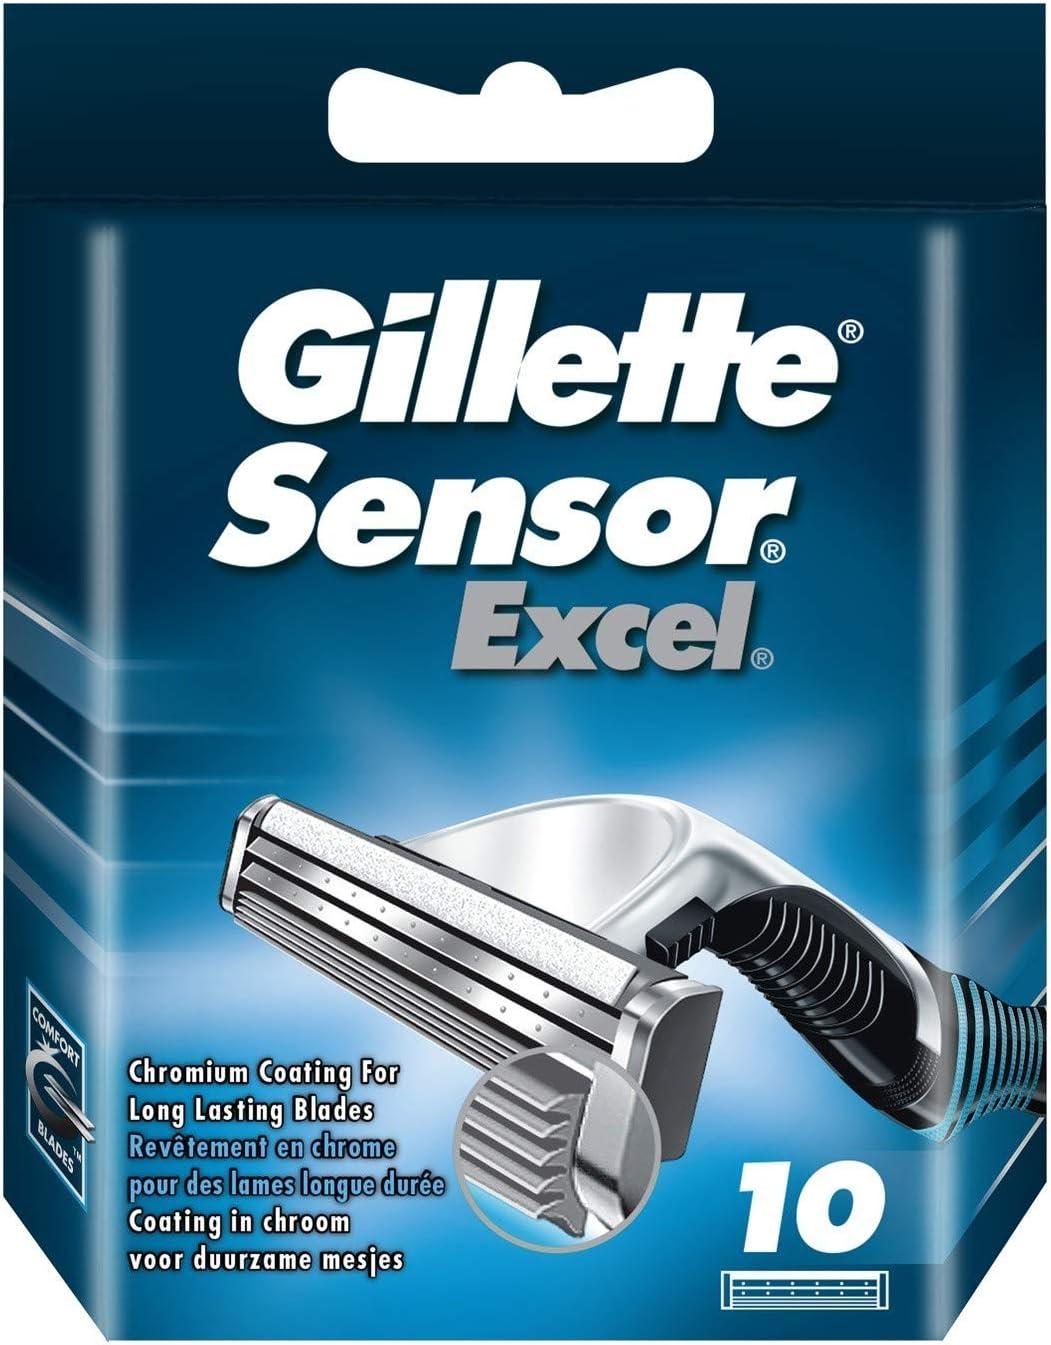 Gillette Sensor Excel Recambio De Maquinilla De Afeitar Para Hombre - 10Recambios